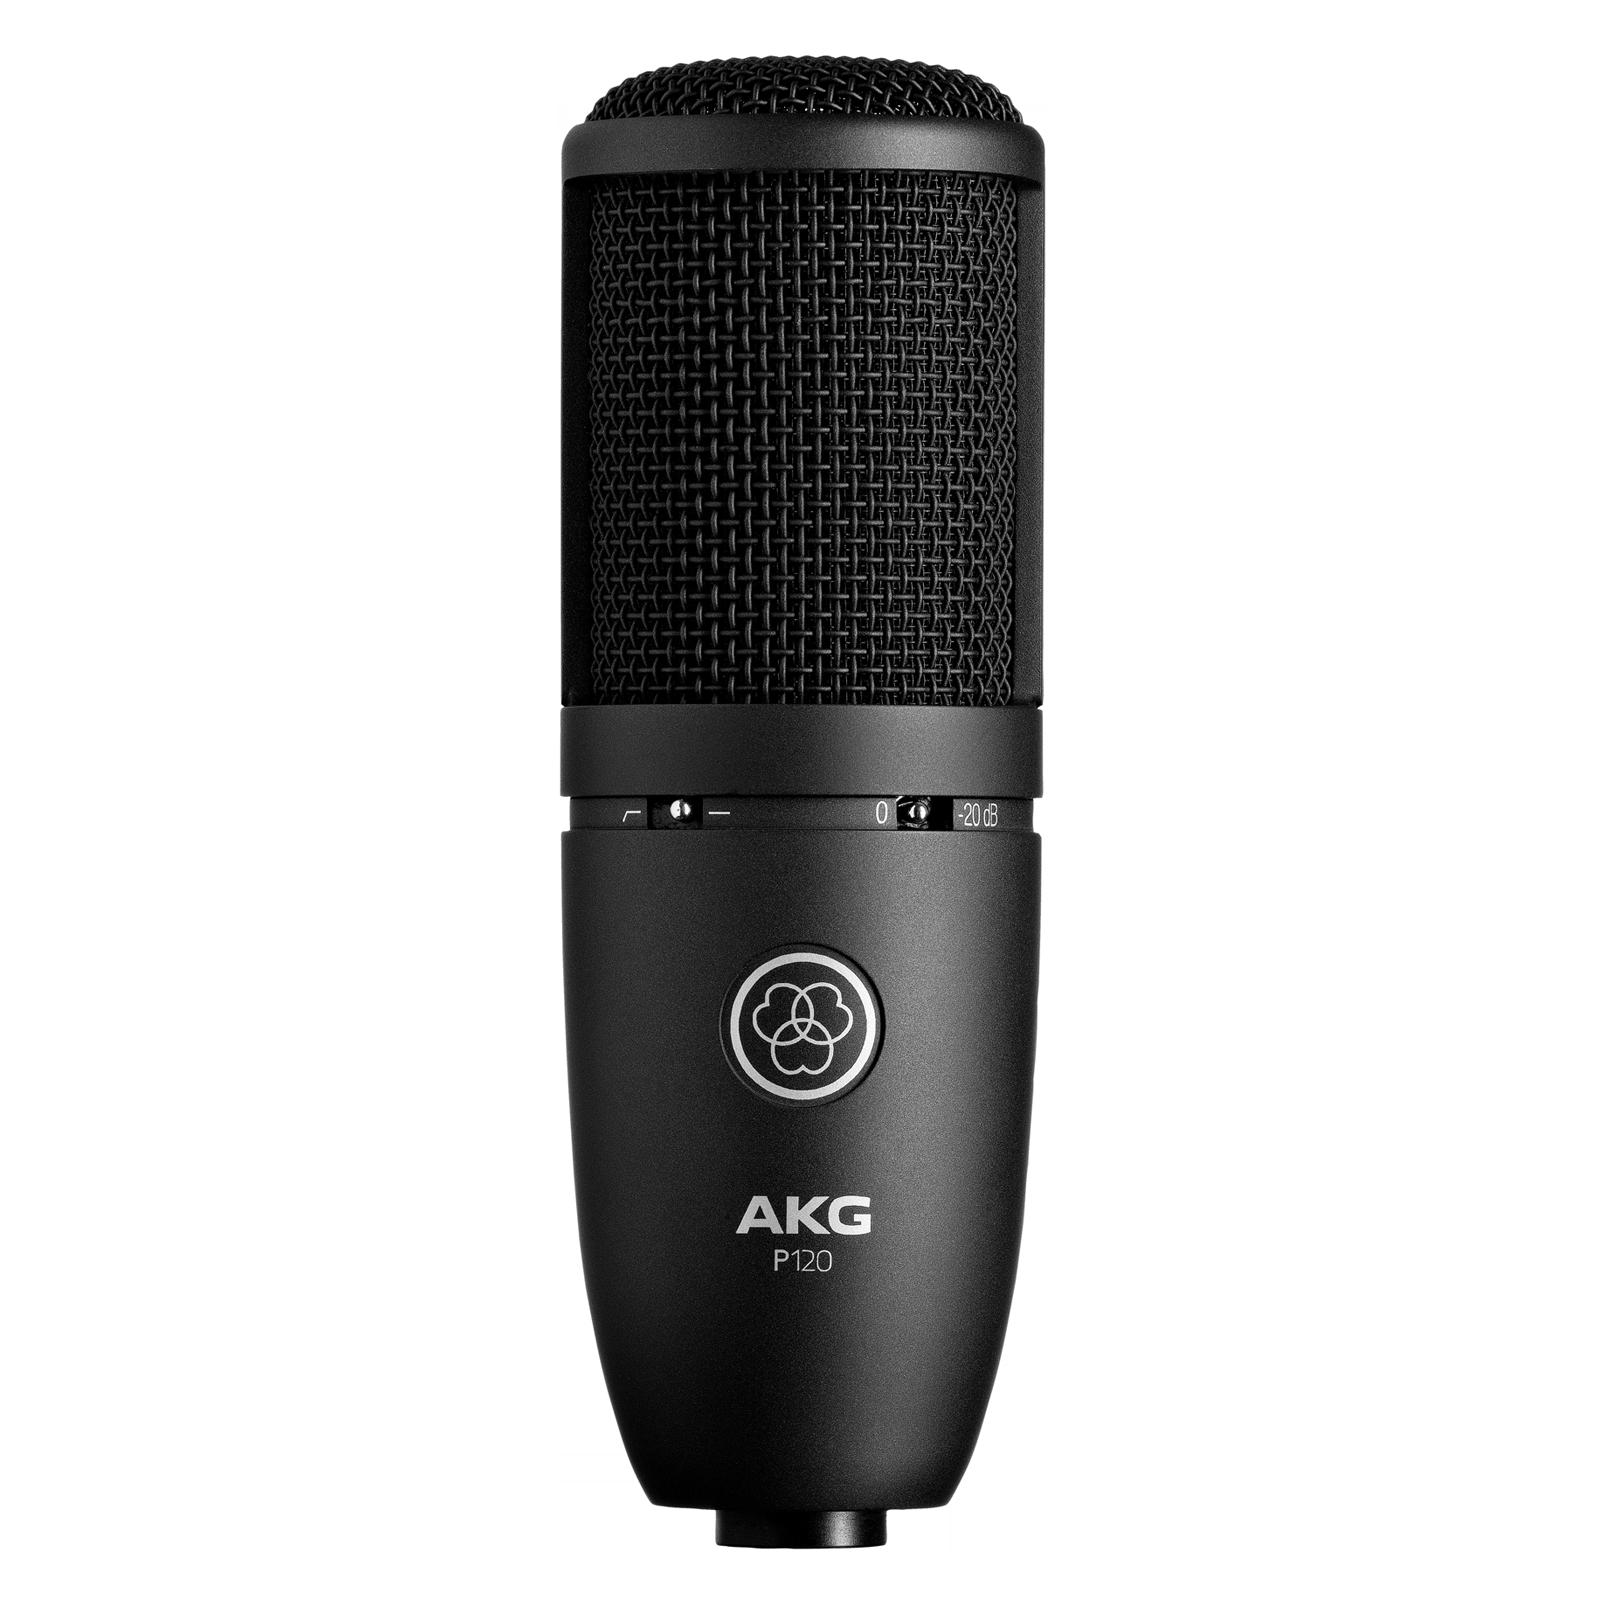 P120 - Black - High-performance general purpose recording microphone - Hero